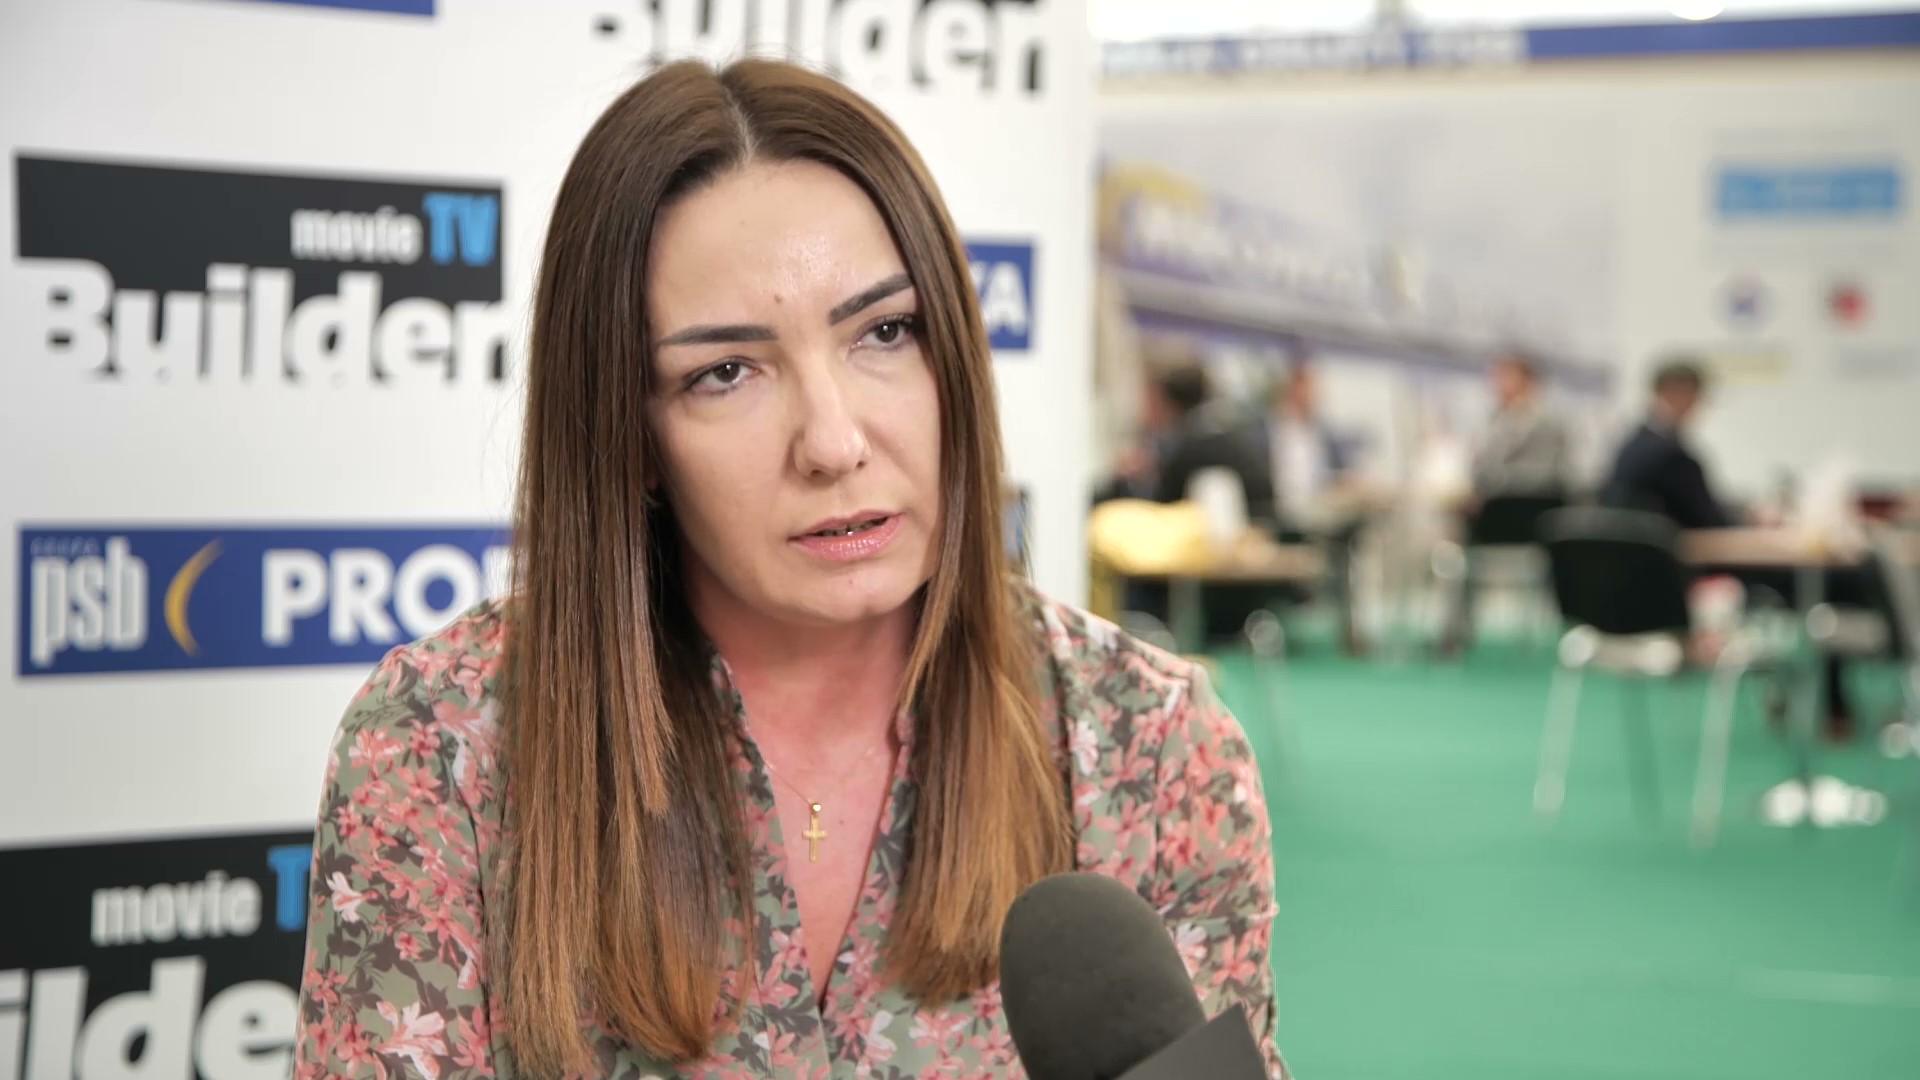 TARGI GRUPY PSB 2020 – ALEKSANDRA GILEWSKA, BAUMIT POLSKA